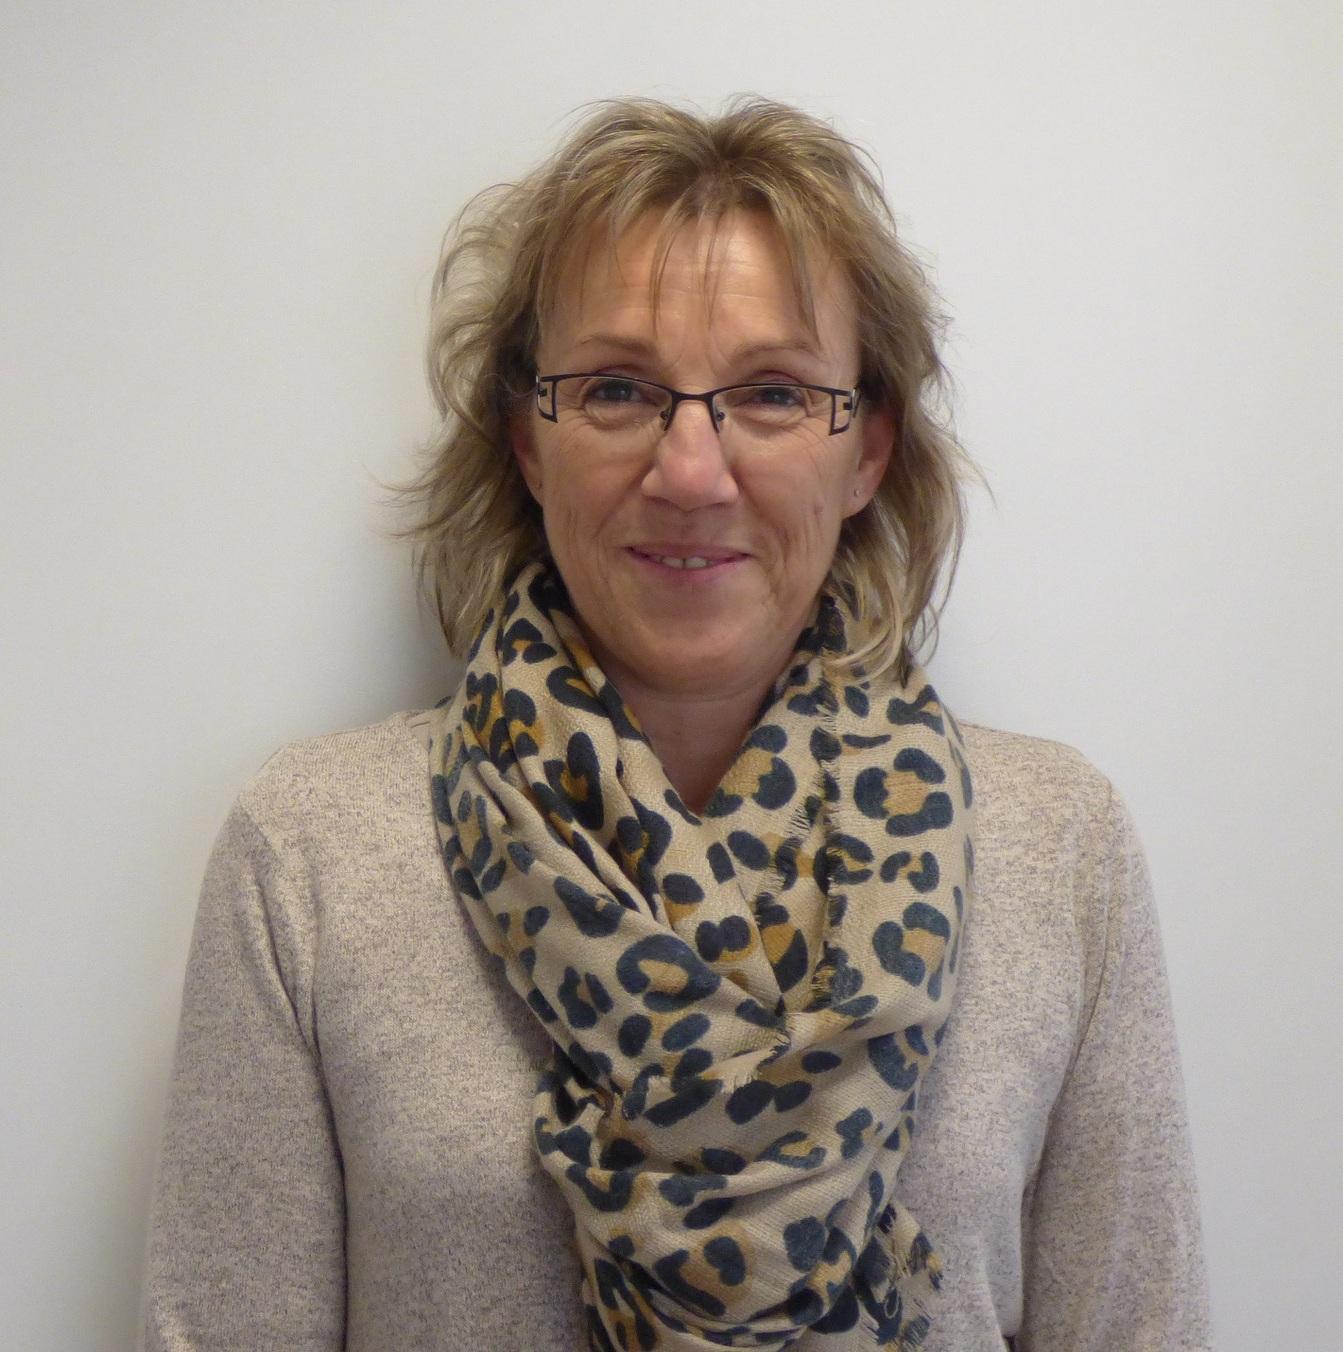 Mme Betton - Administratif